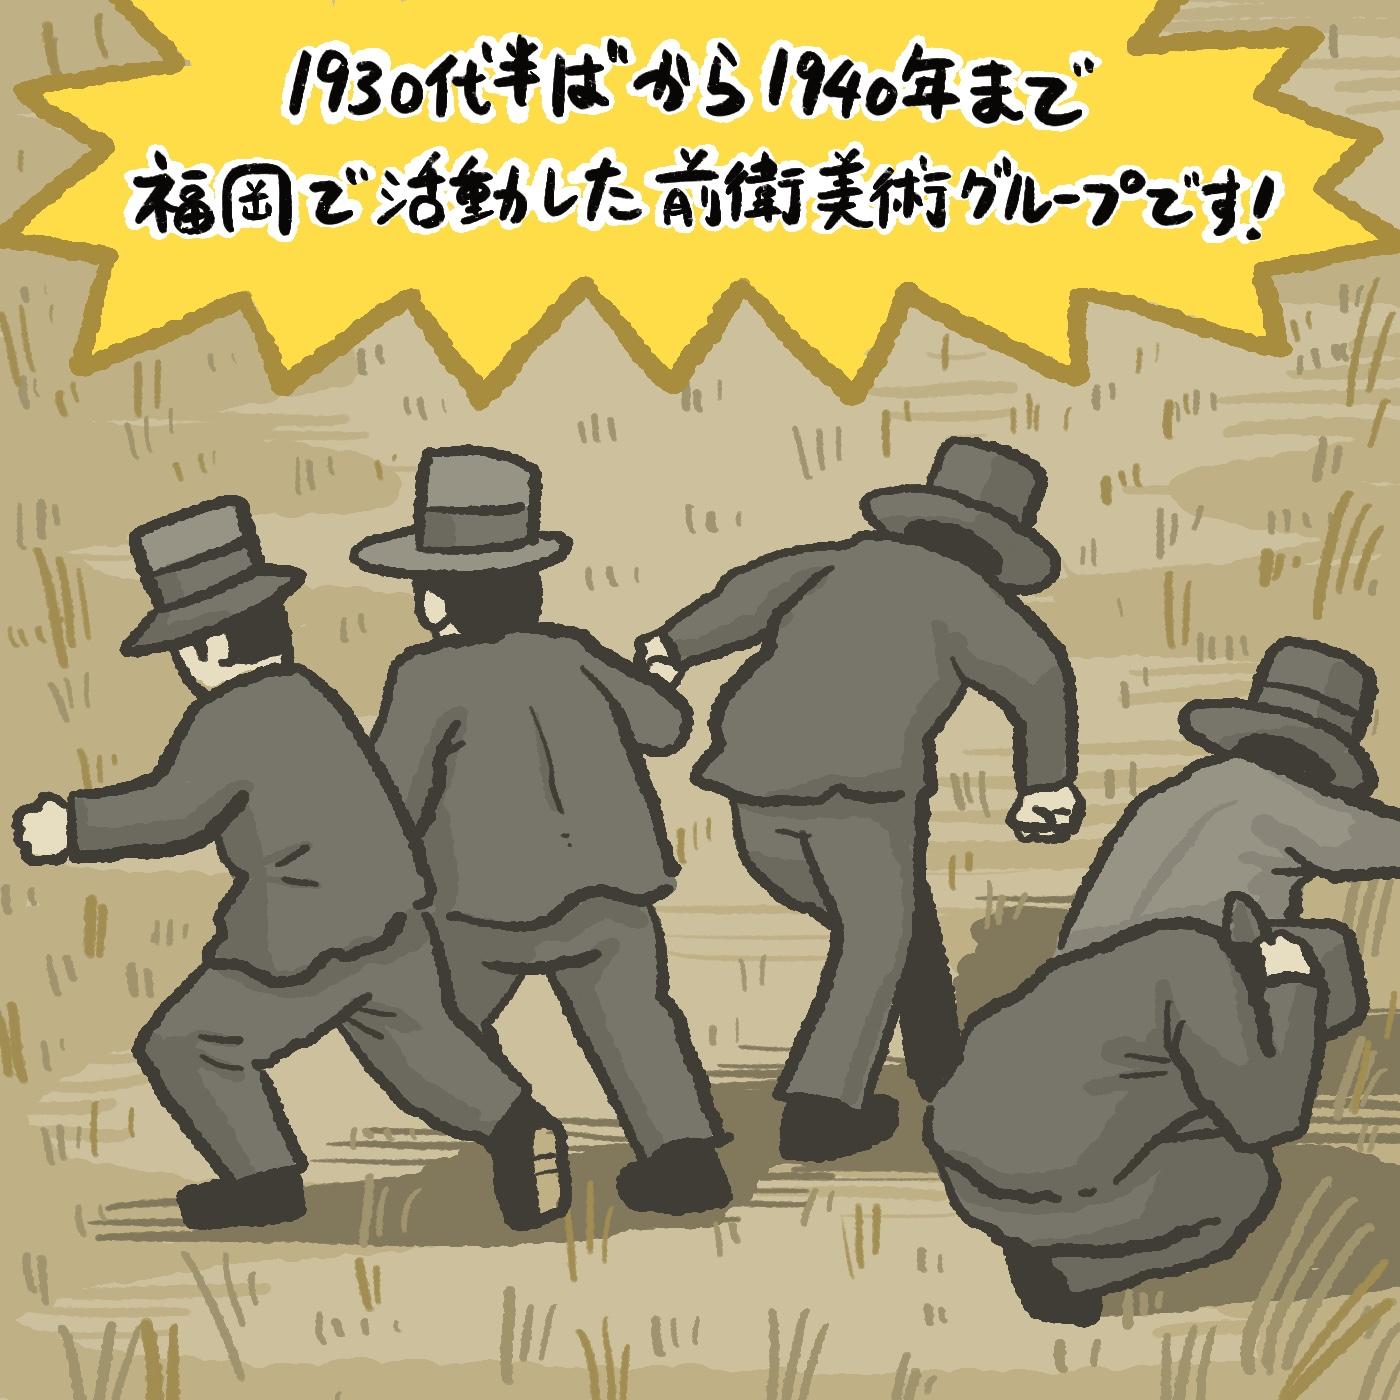 OBIKAKE ナニソレ ソシエテ・イルフ